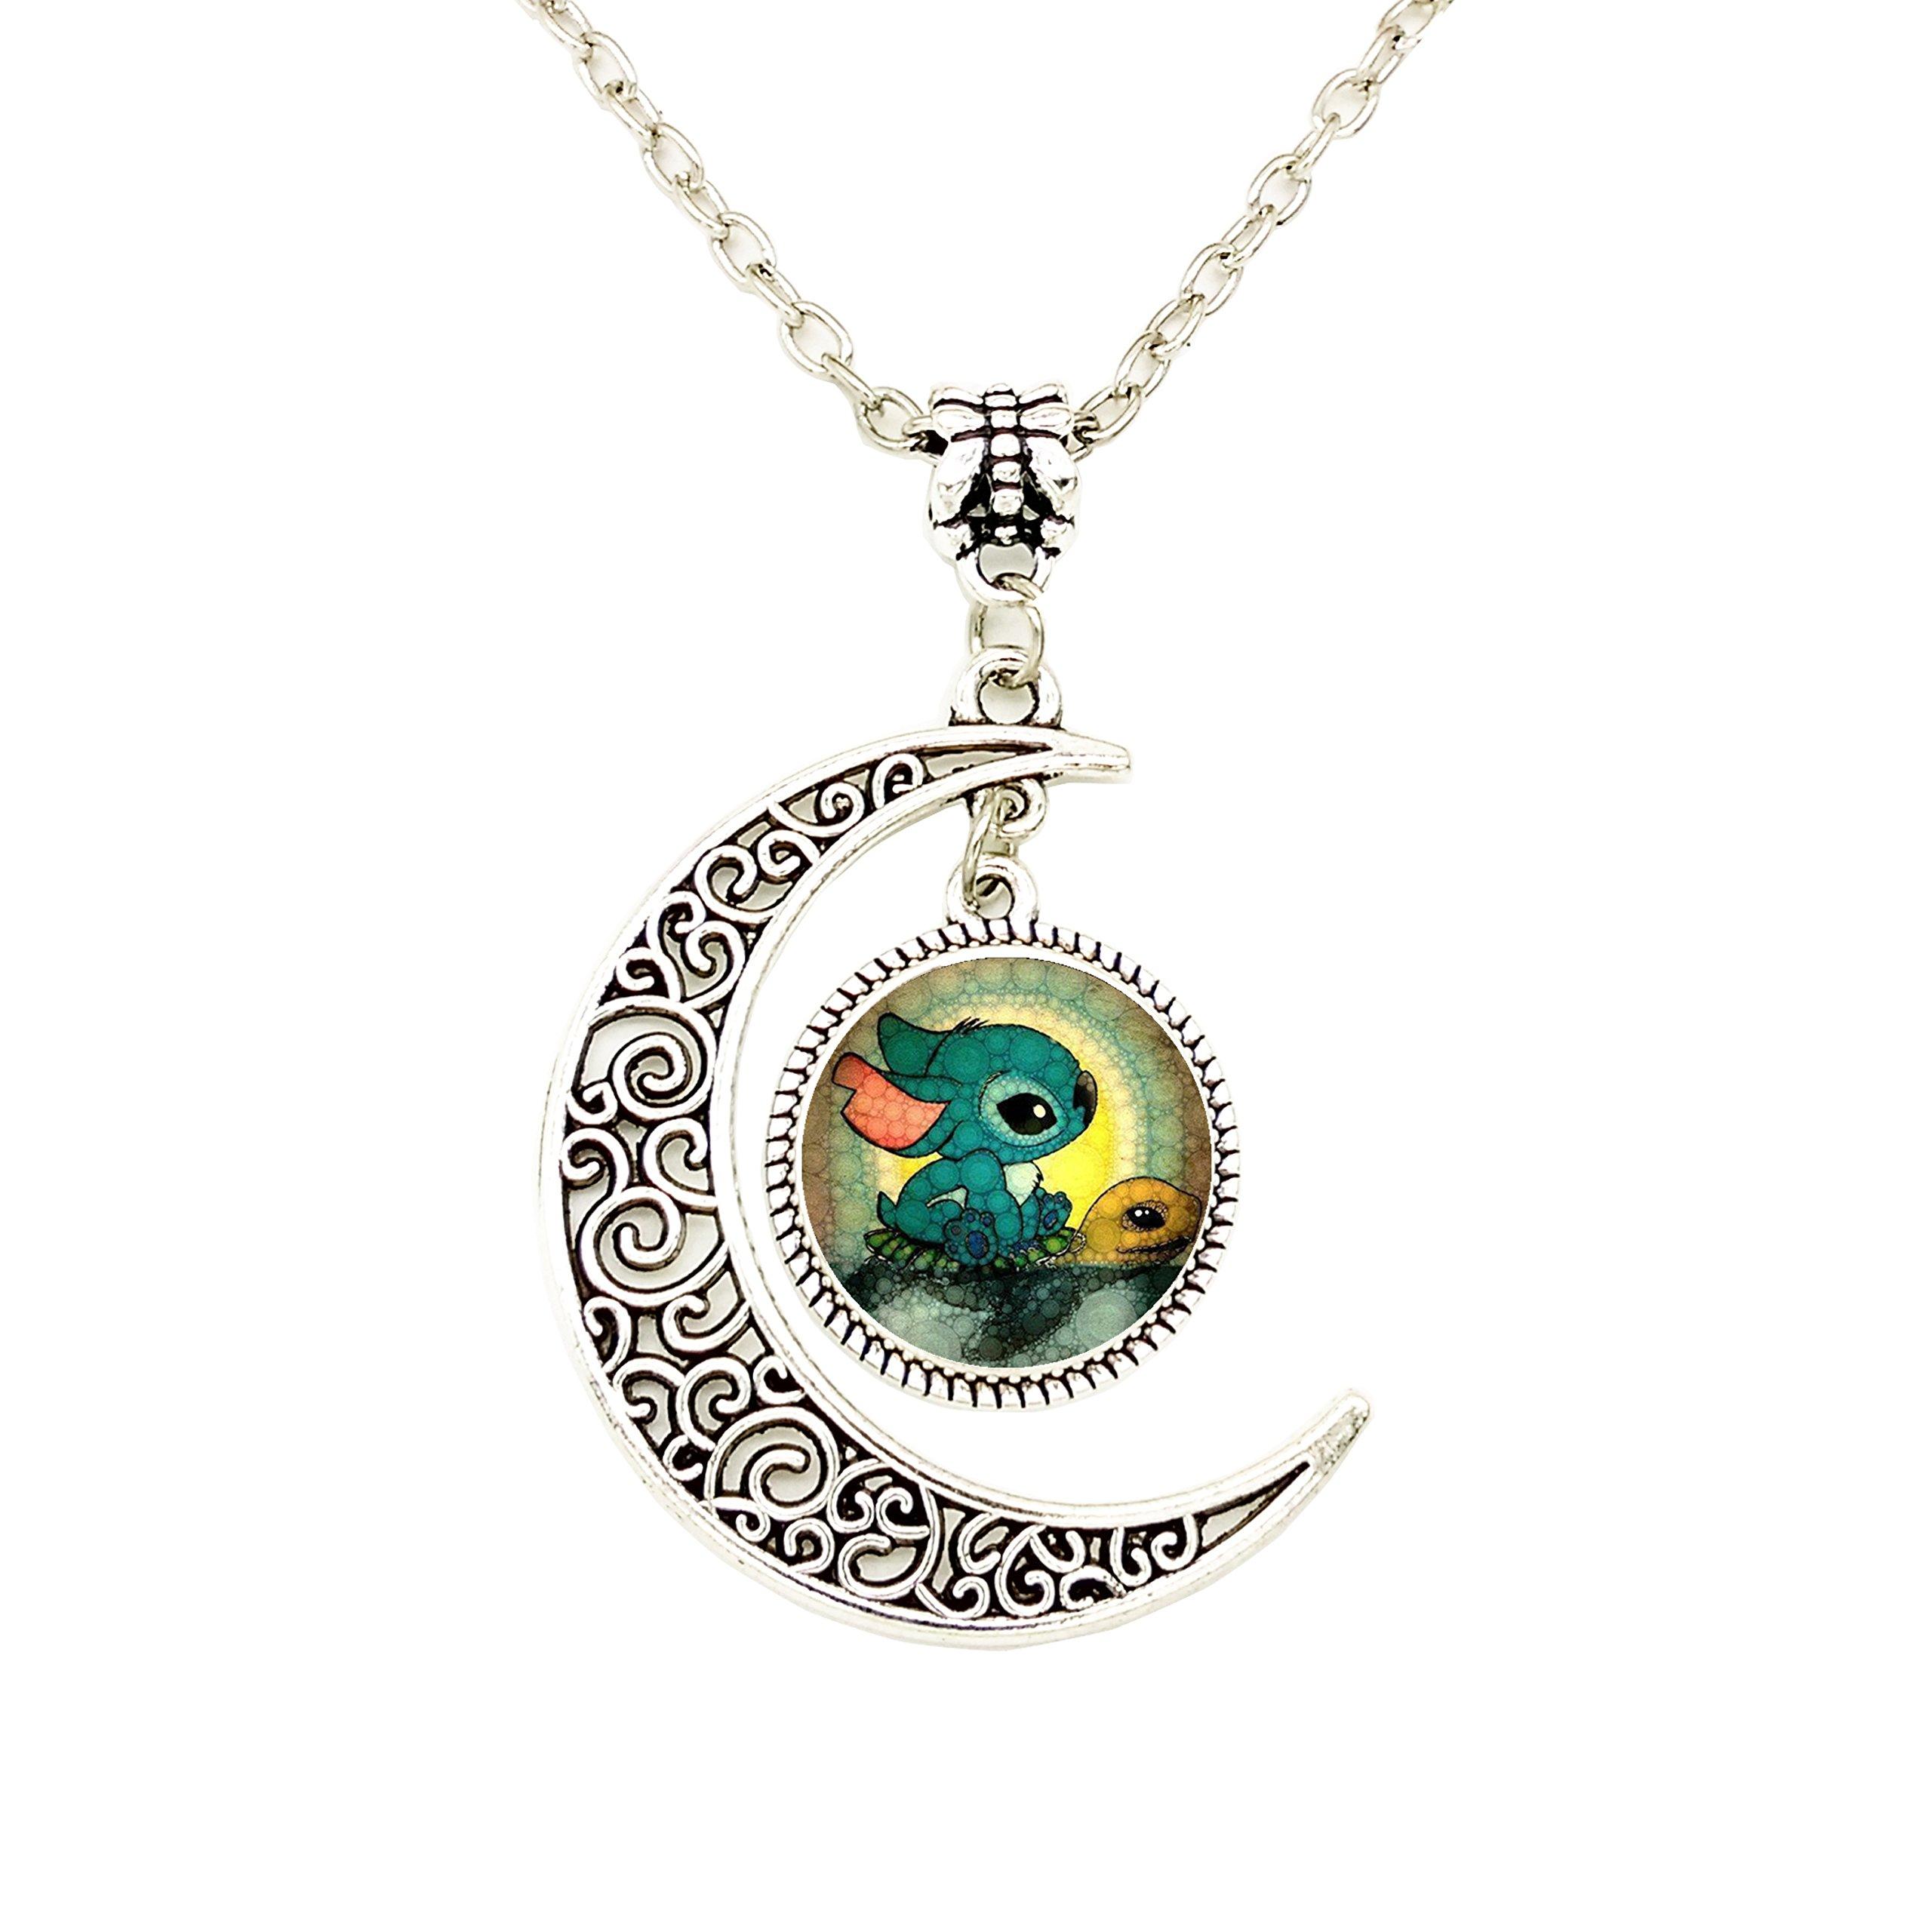 Liumart Handmade Moon Cartoon Pendant Necklace, Cute Crescent Moon Jewelry